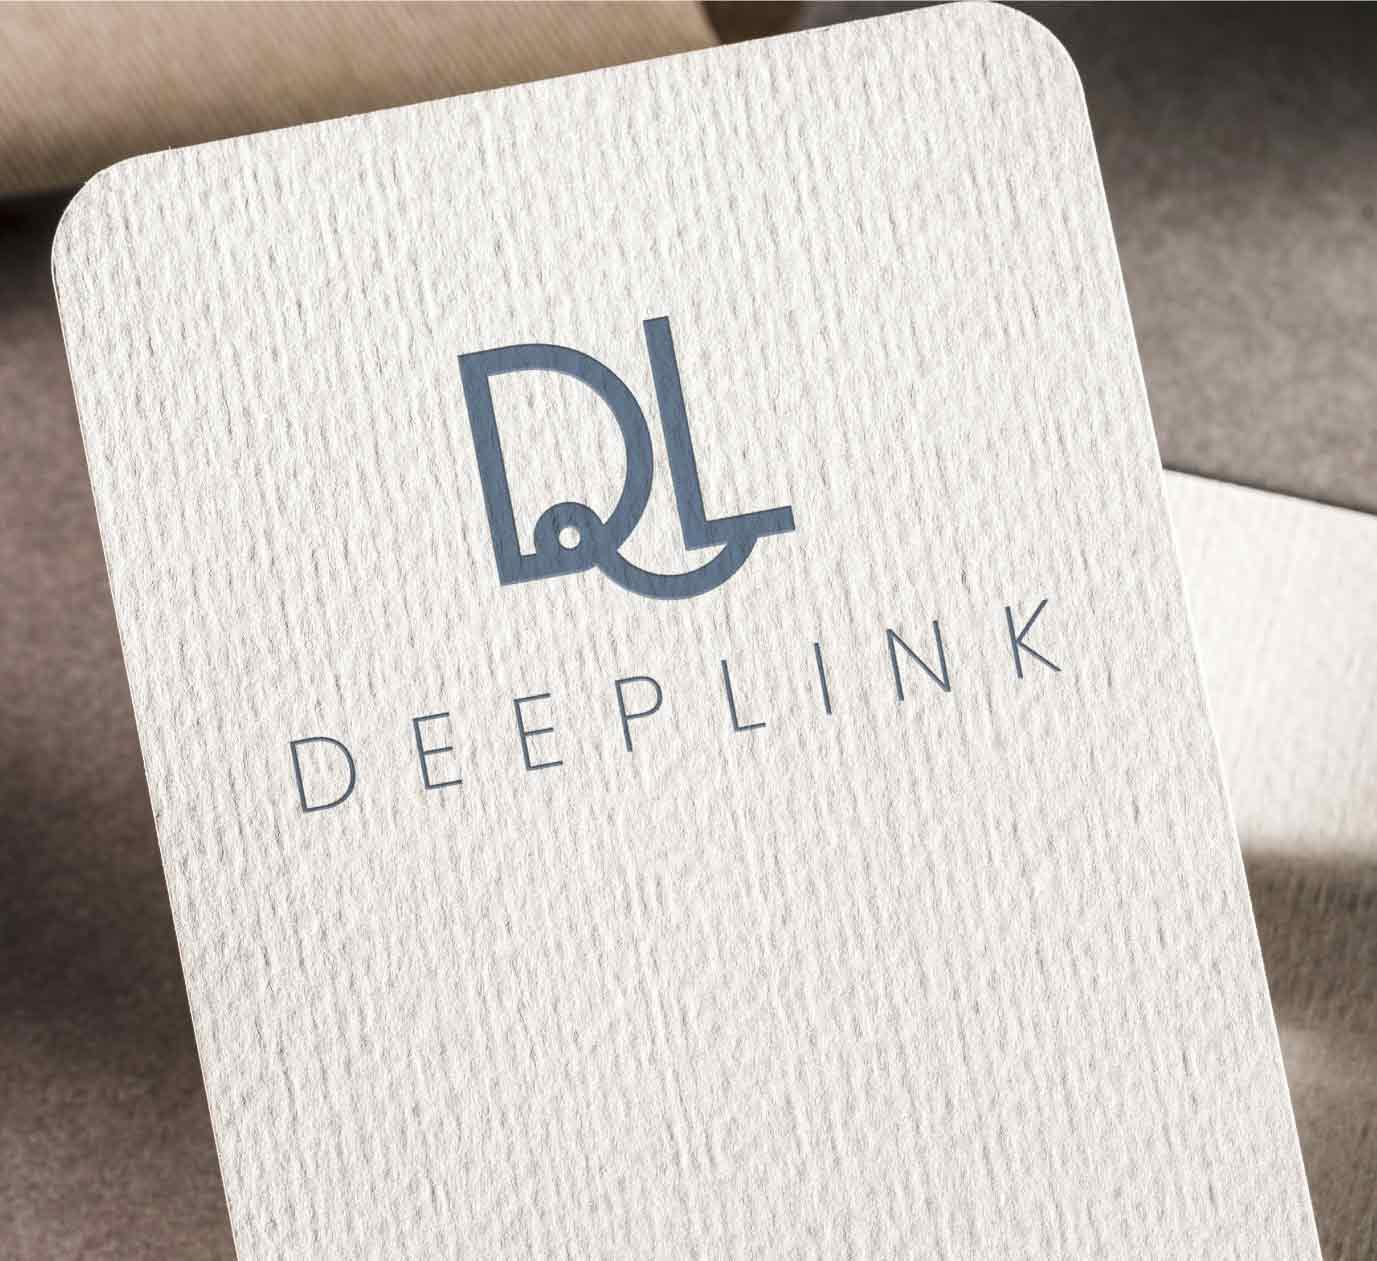 LOGO-Deeplink-agence de communication -vuenova